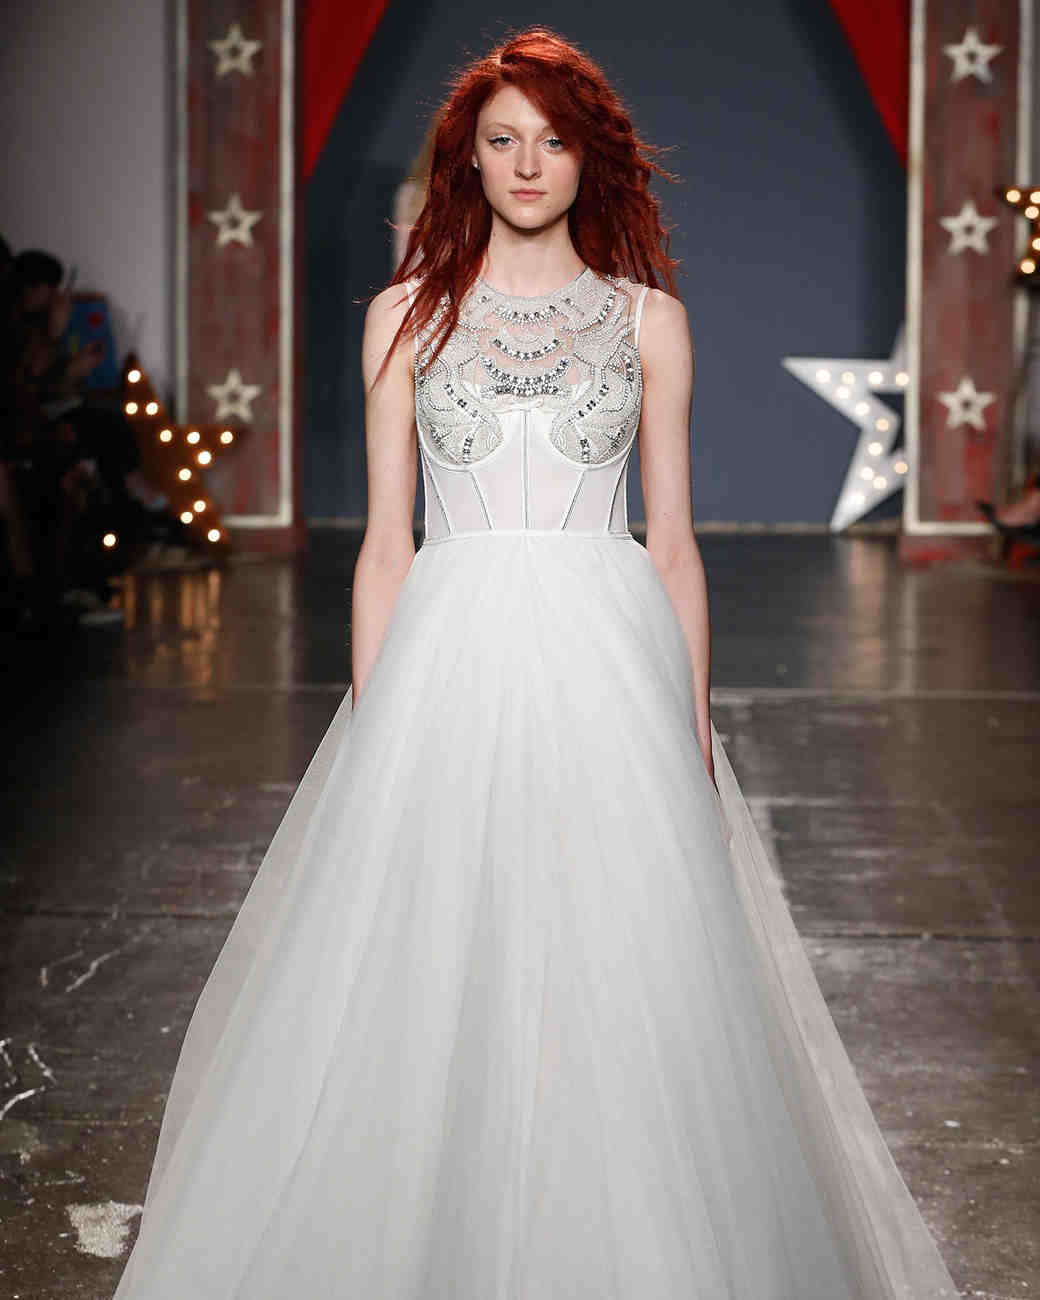 jenny packham wedding dress spring 2018 high neck embellished ballgown